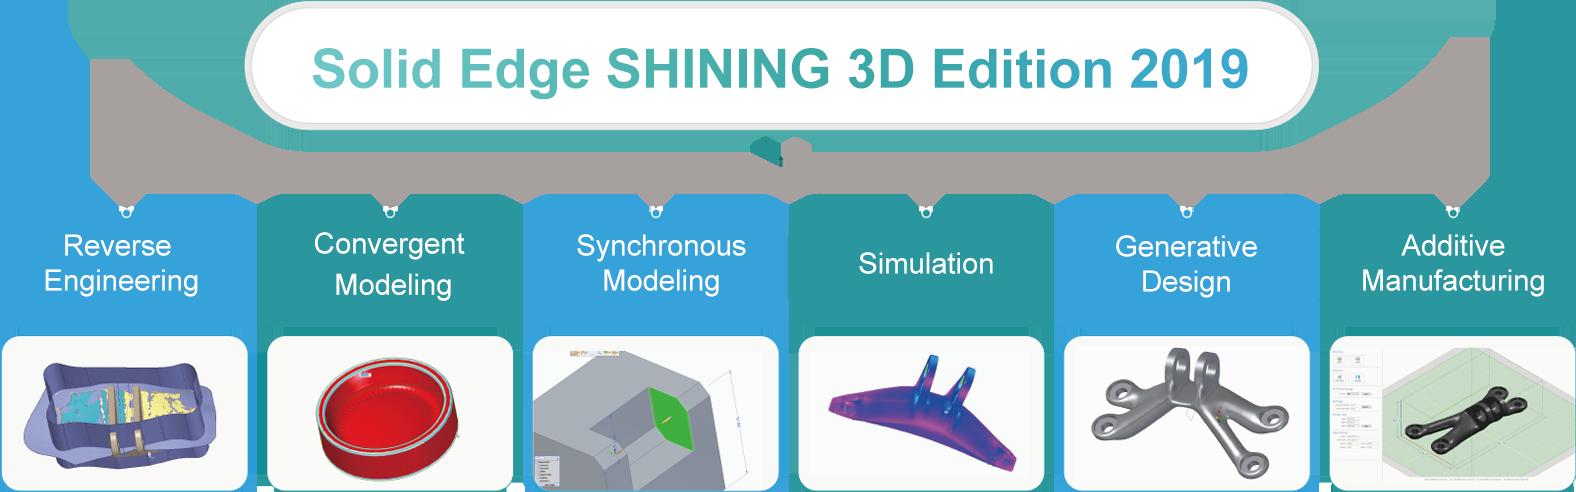 SolidEdge Shining3D Edition